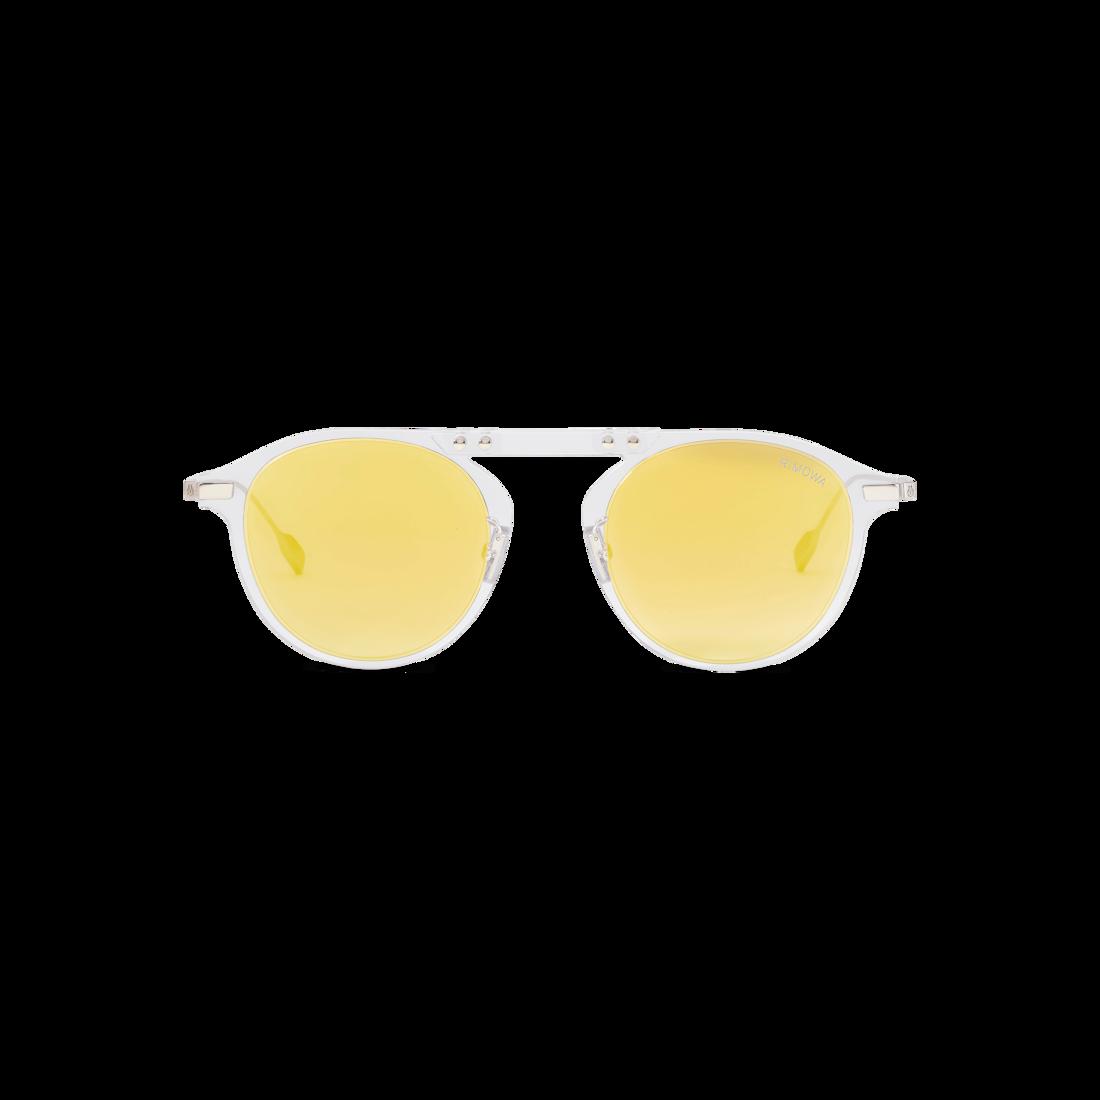 Bridge Pantos Crystal Yellow Mirrored Round Sunglasses Rimowa